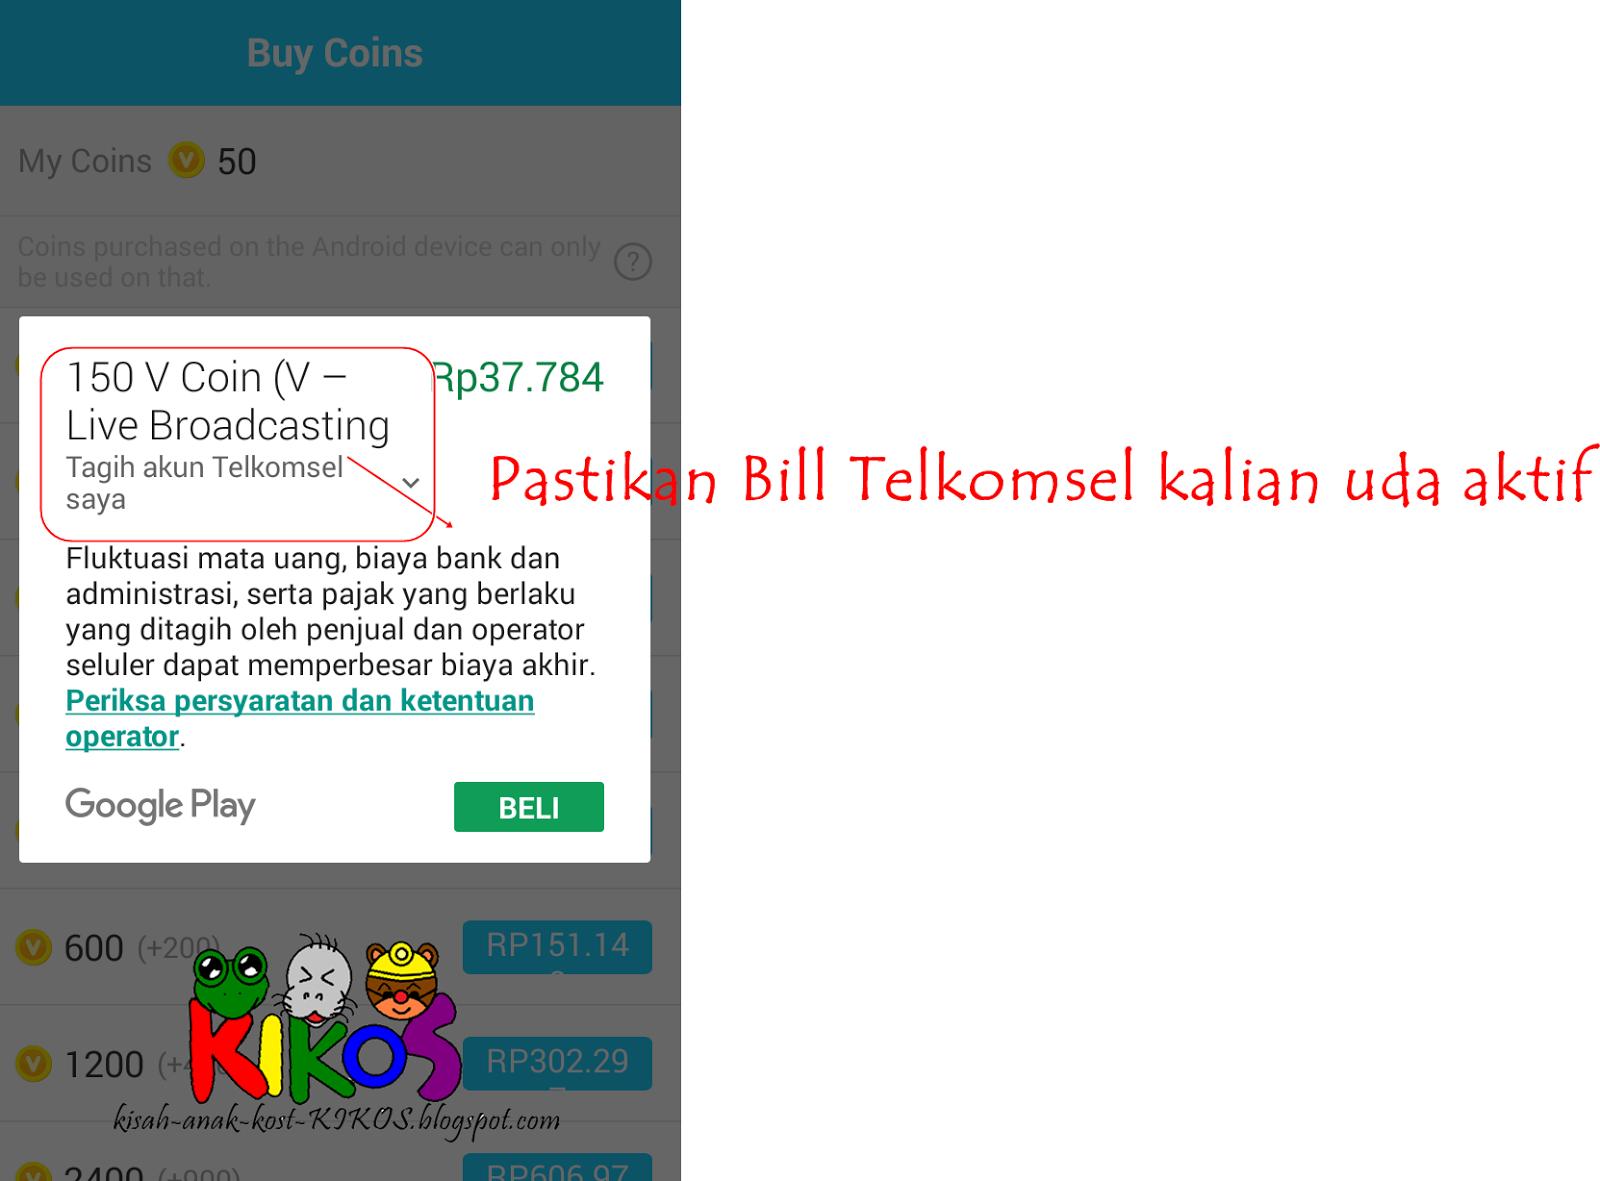 Kisah Anak Kost (KIKOS): (Review V Live Channel+) : Cara